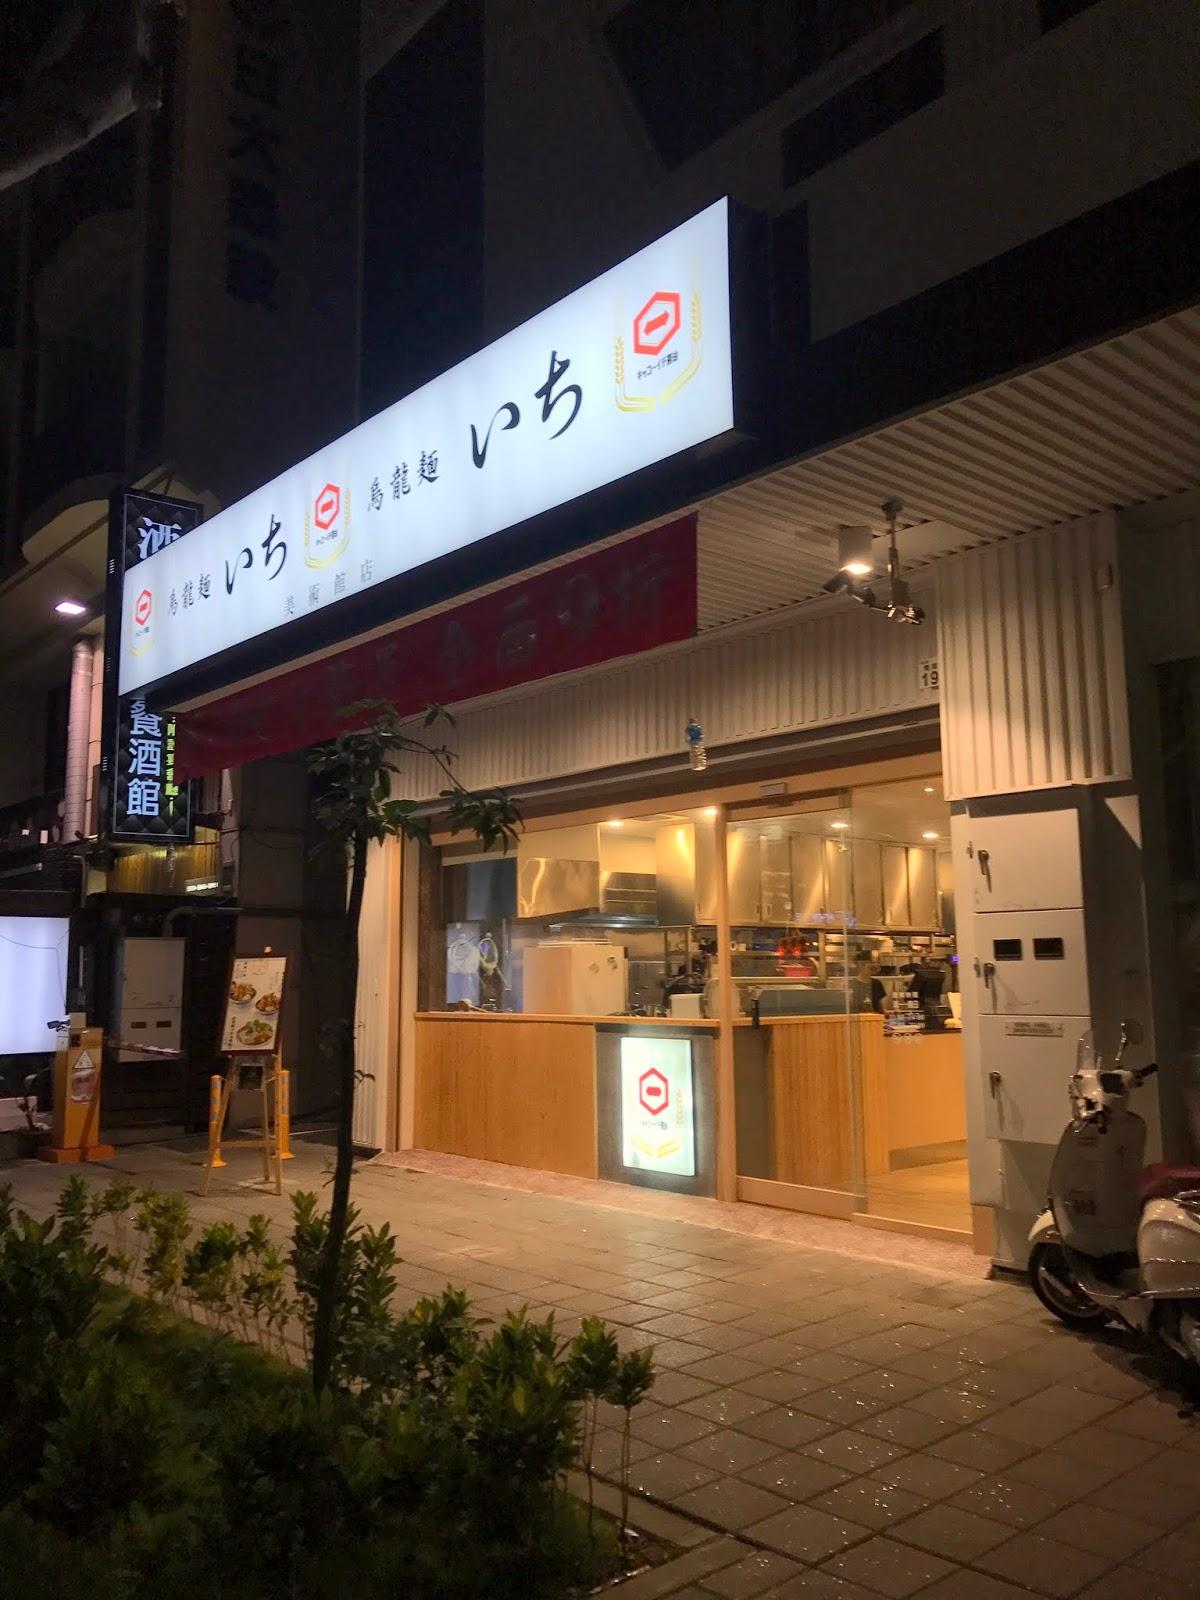 Kaohsiung Table!鳳梨人之高雄攻略: 美術館區烏龍麵店新選項 - 龜一烏龍麵 美術館店